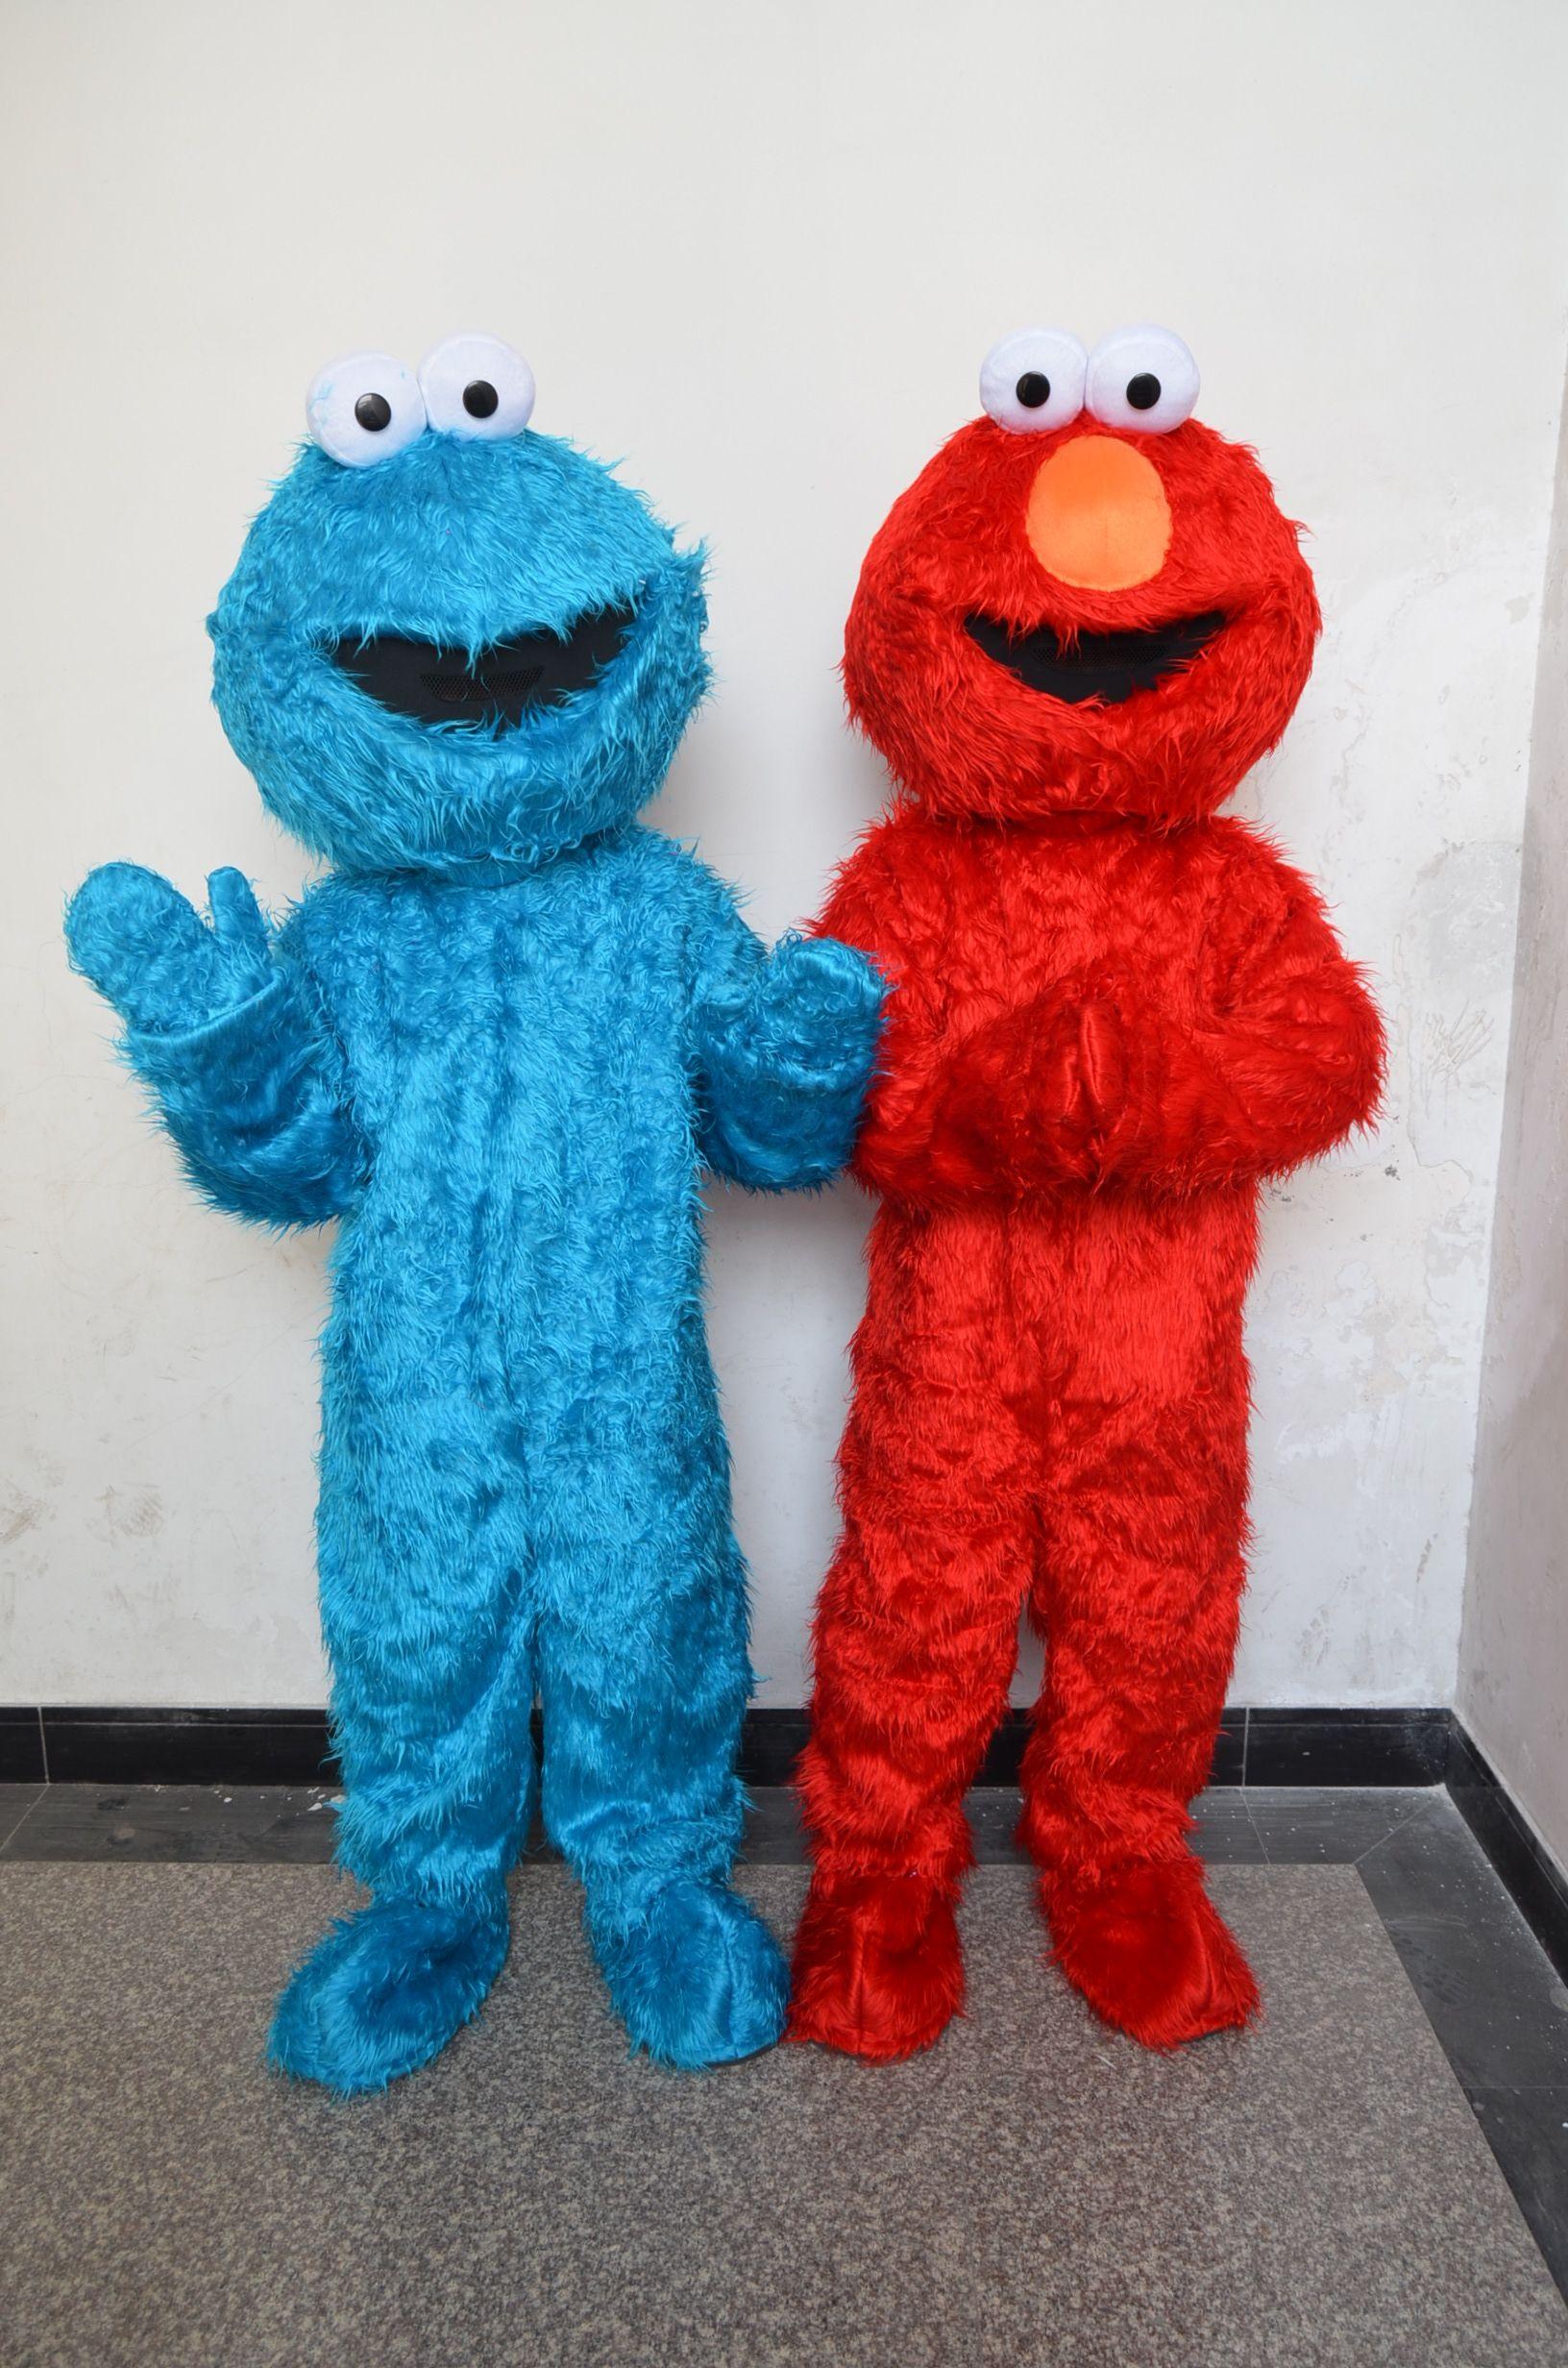 Sesame Street Video Player Current Clips  Muppet Wiki